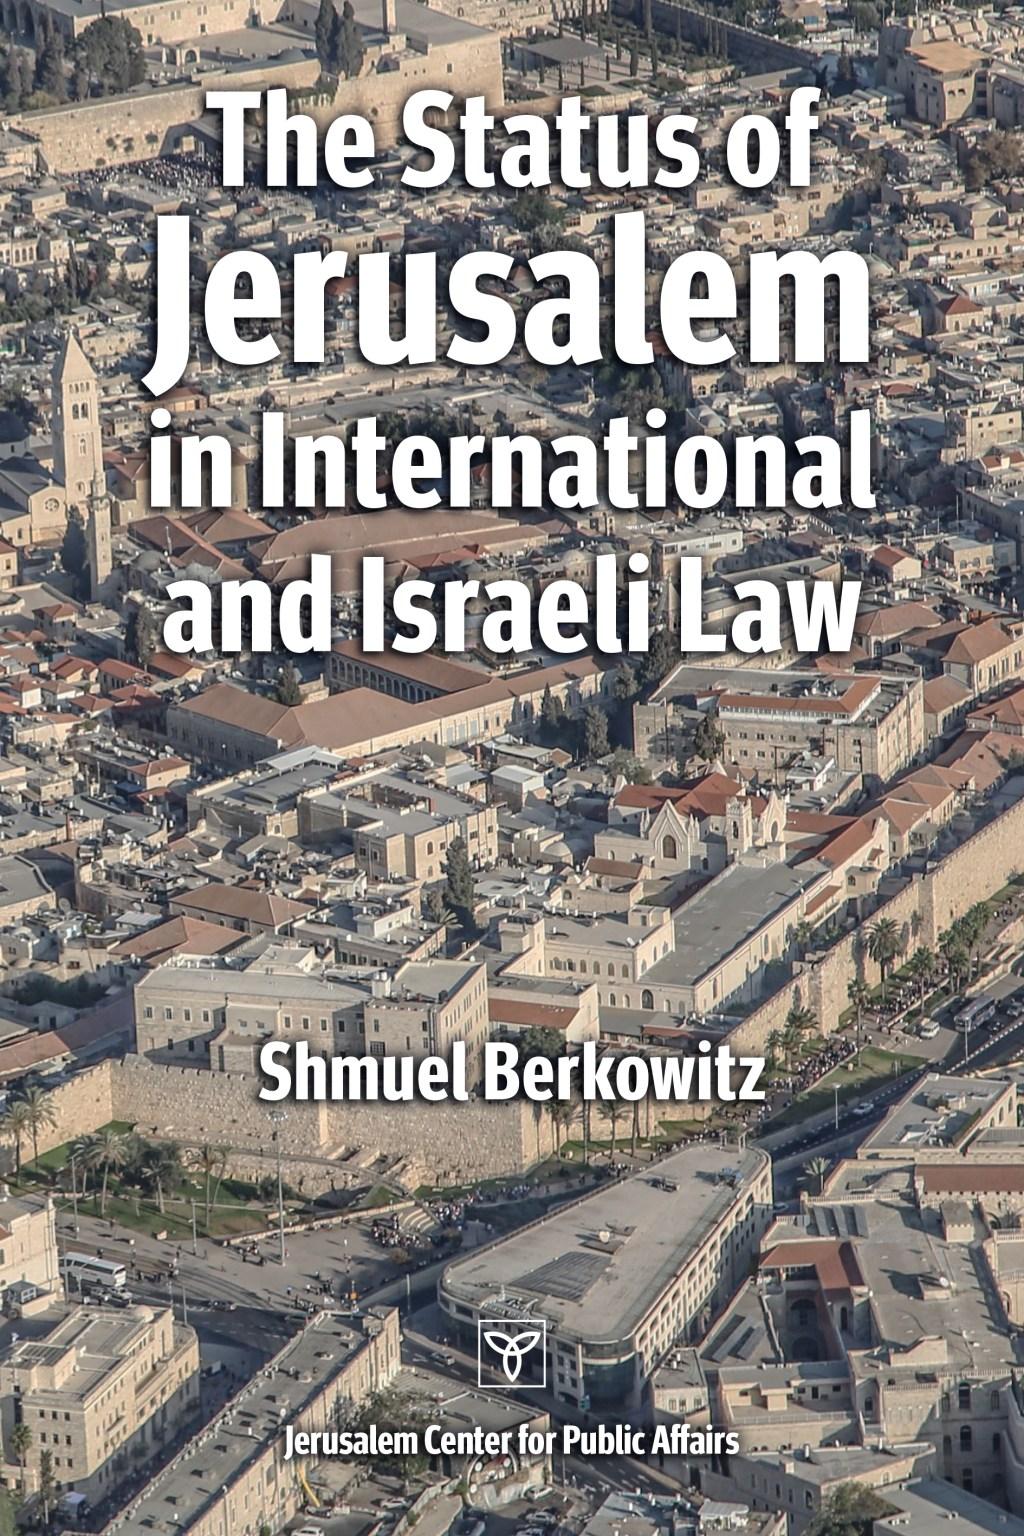 The Status of Jerusalem in International and Israeli Law